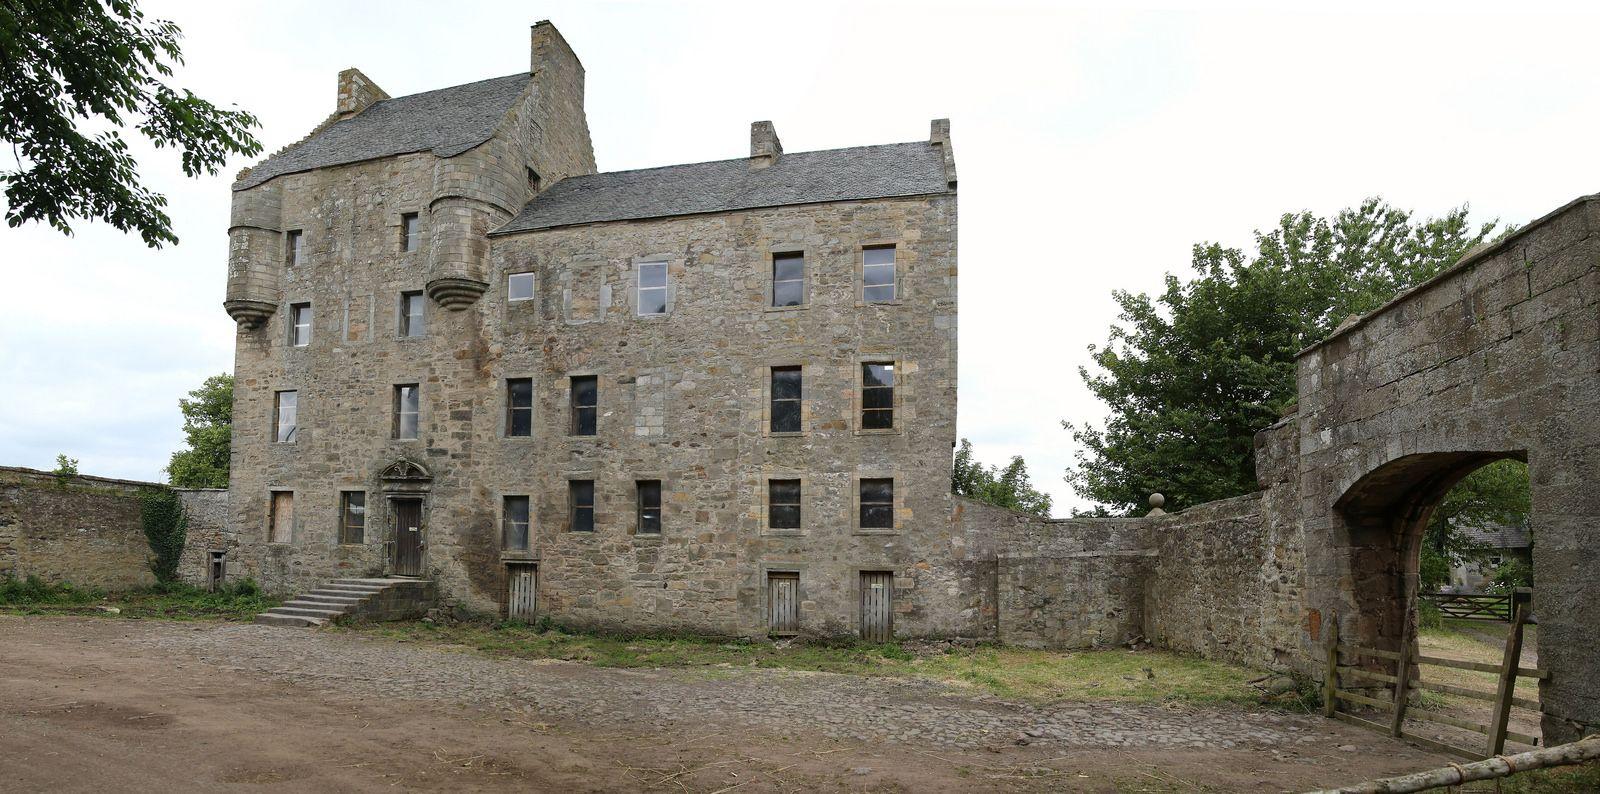 Midhope Castle 4 Castle Castles Interior Outlander Locations